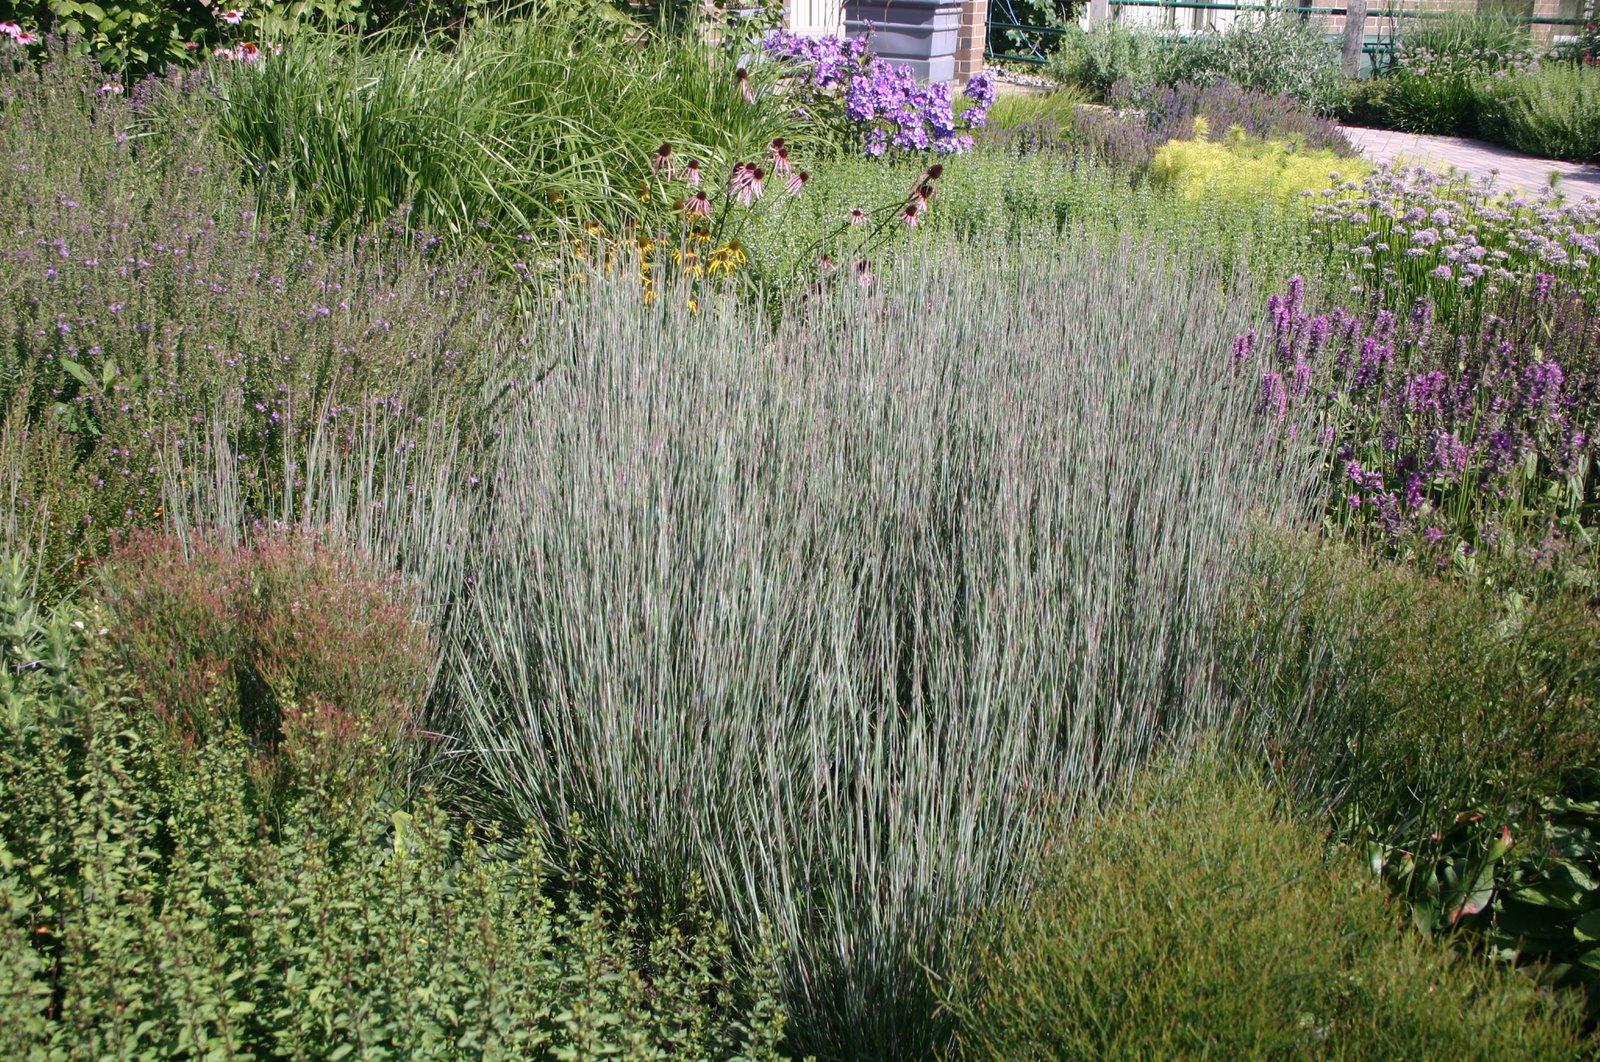 Gardener in a forest hot trend in residential landscapes for Short grasses for landscaping